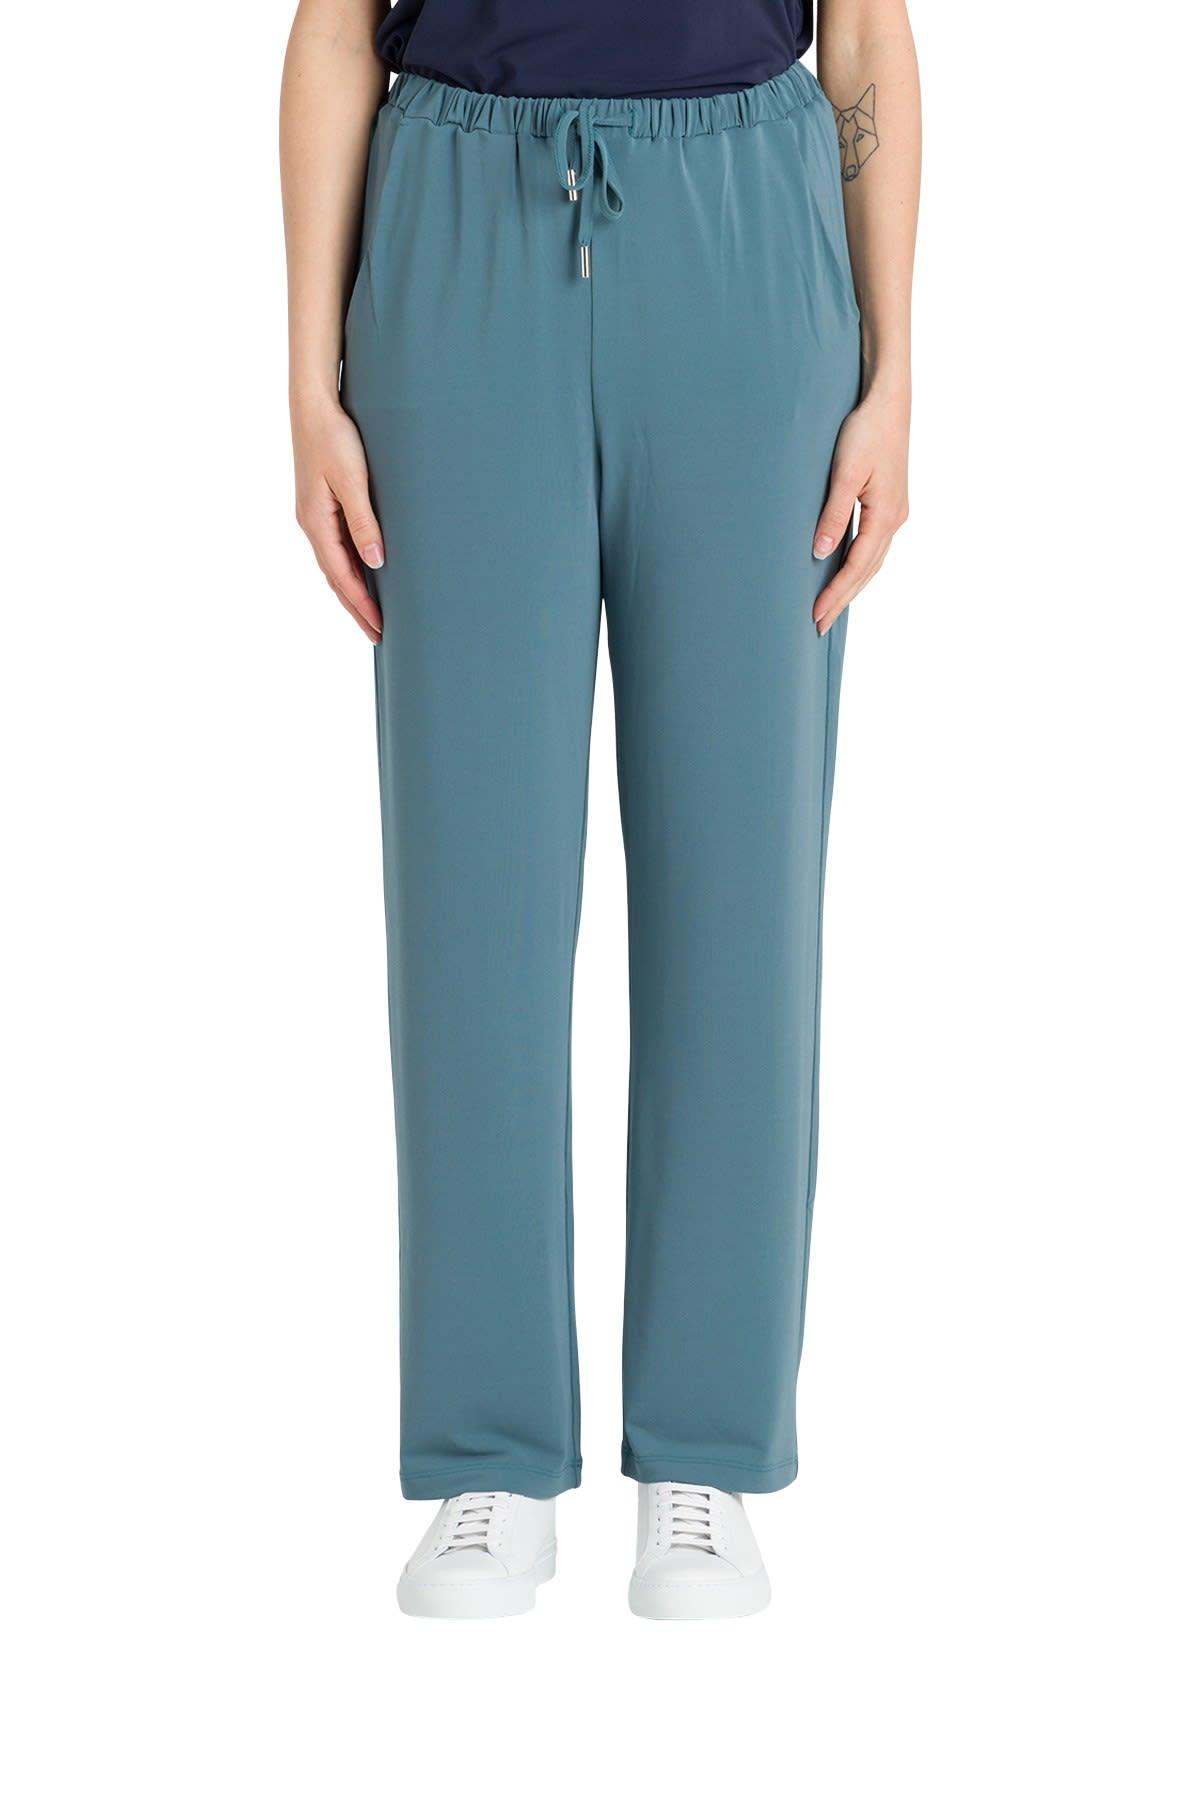 Max Mara Elastic Waist Trousers